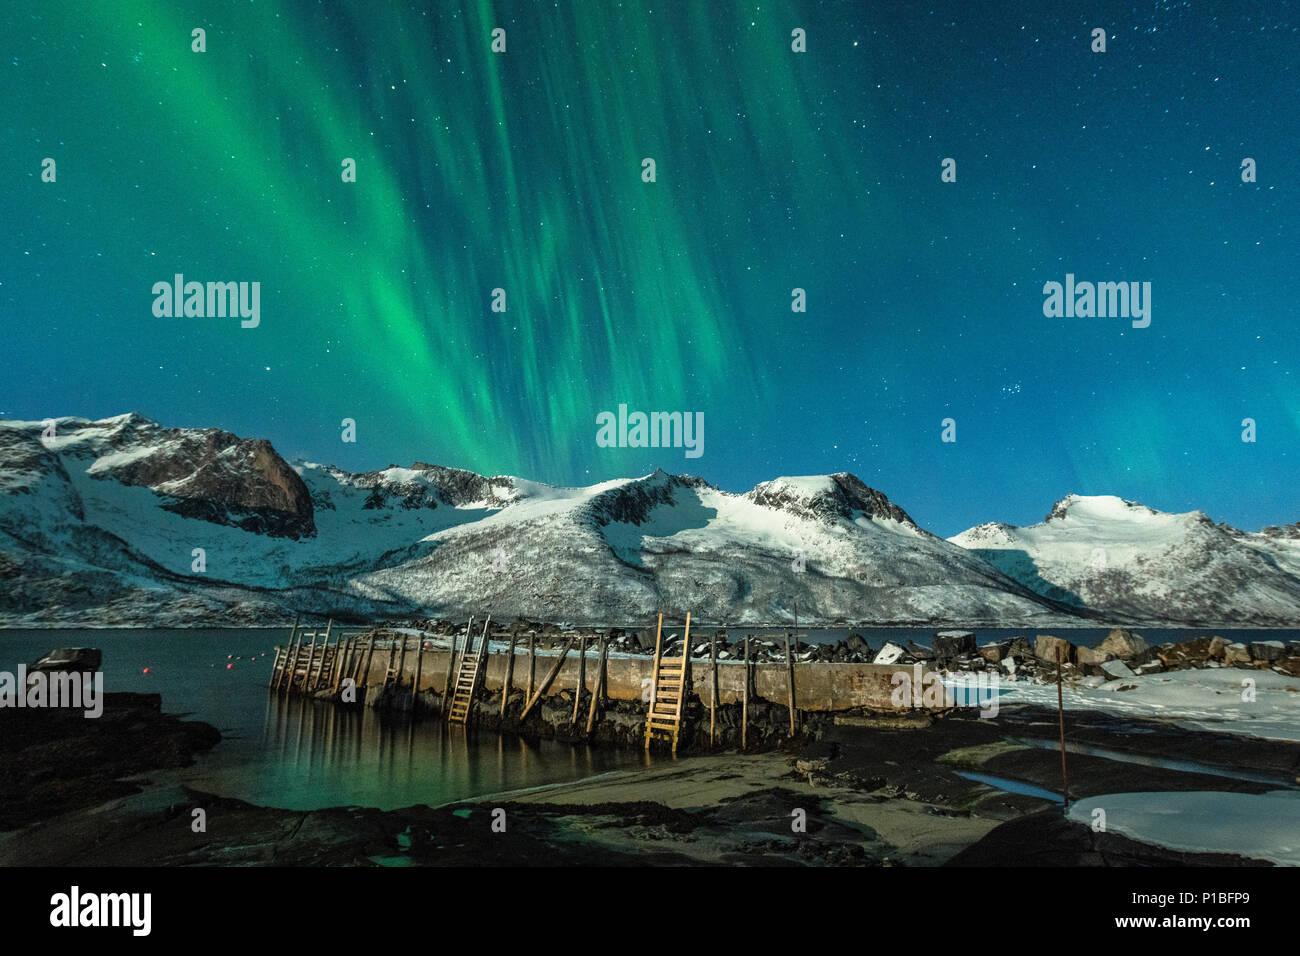 Nordlichter über Baltsfjord bei Nacht, Senja, Norwegen Stockbild